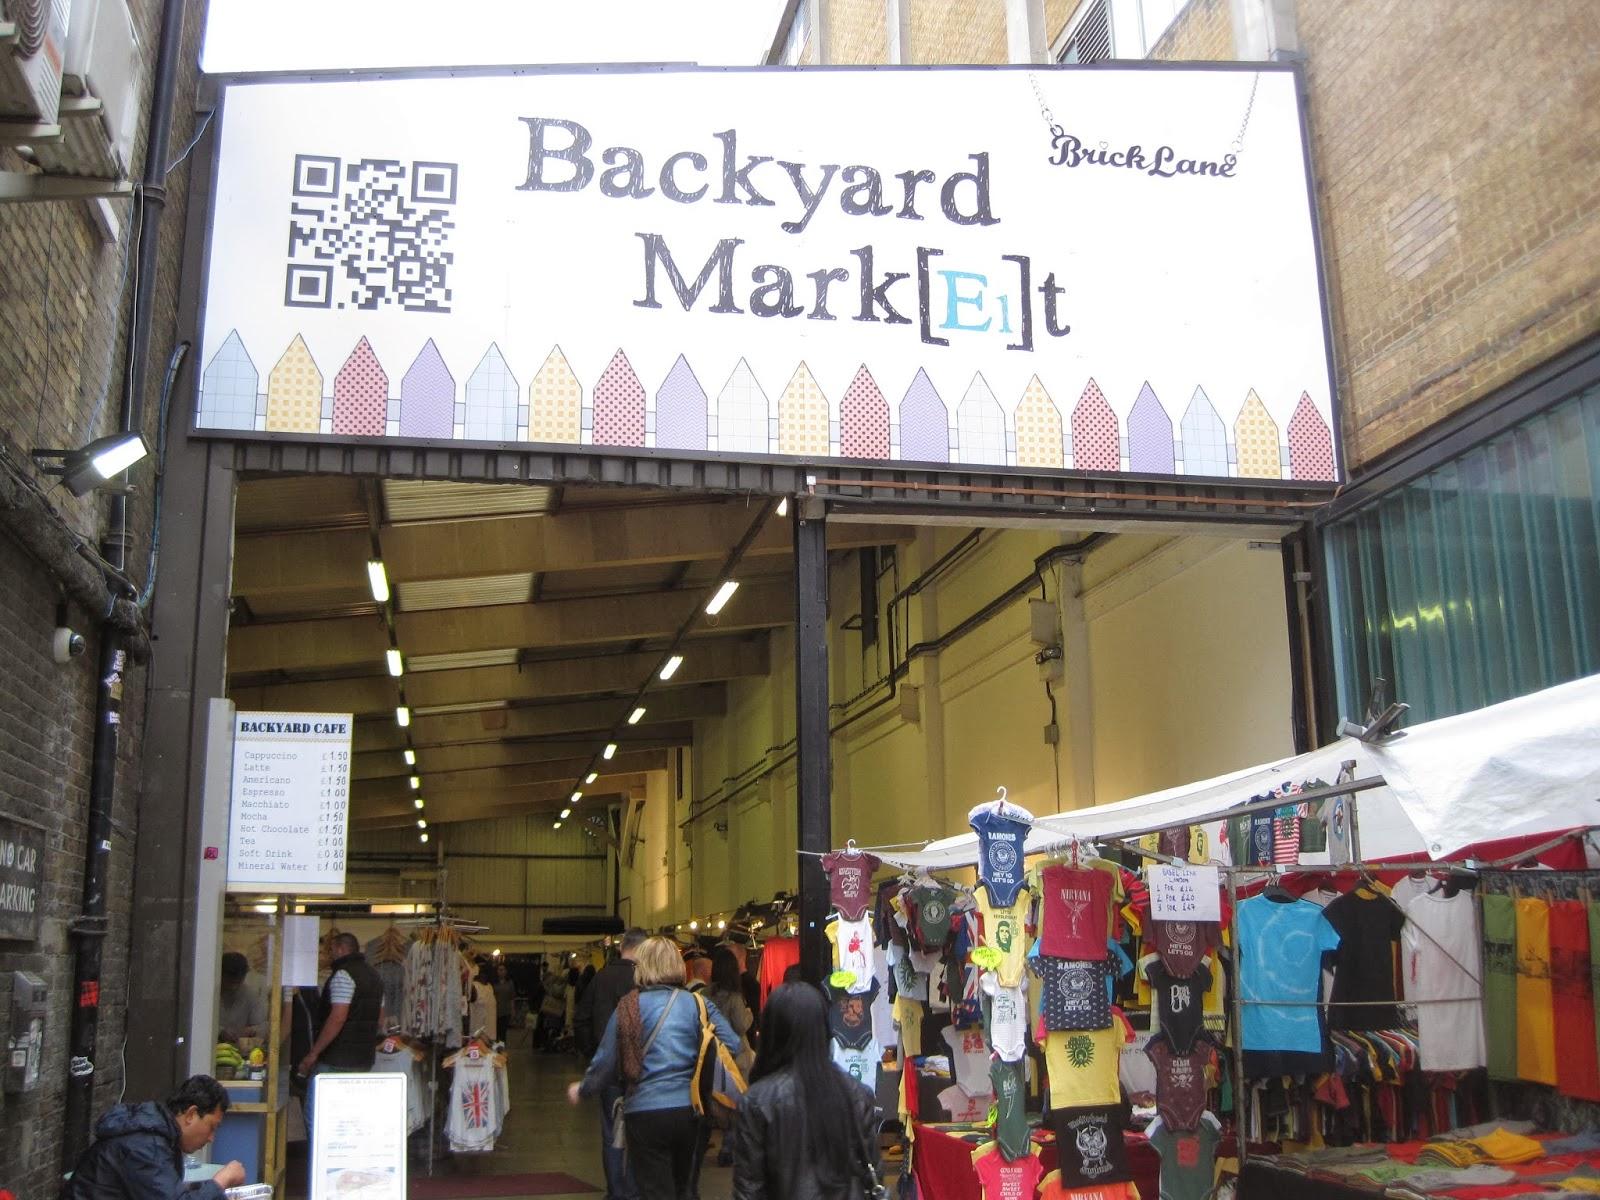 Backyard Market, Brick Lane.